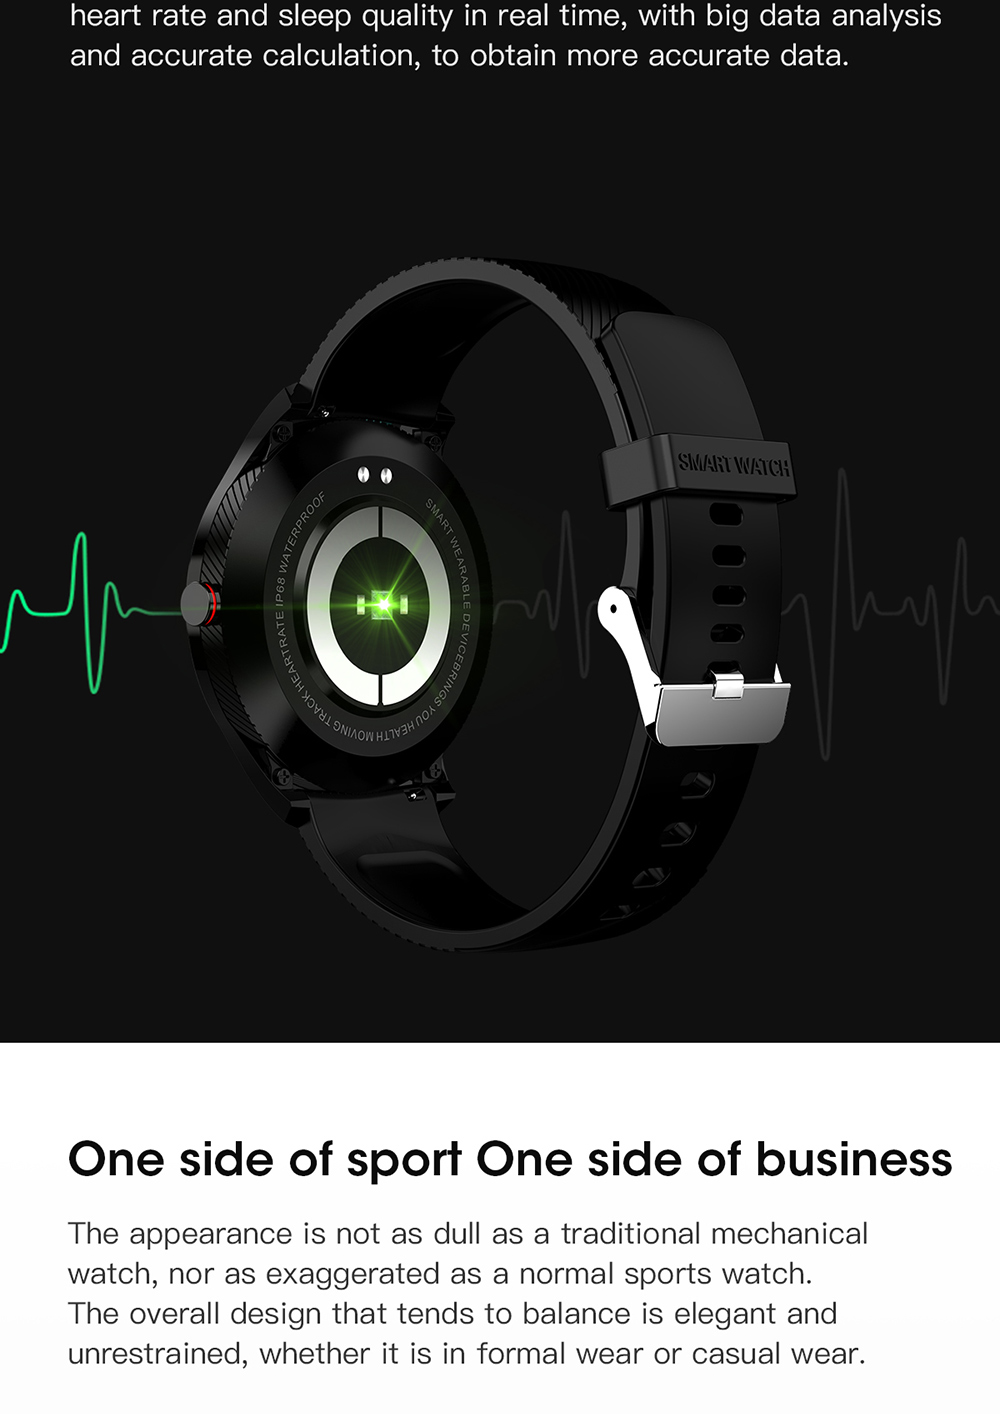 H9c36c71bbcee4cdb8d45853d3afc5bd24 696 L9 Full touch Smart Watch Men ECG+PPG Heart Rate Blood Pressure oxygen Monitor IP68 Waterproof Bluetooth Smart Bracelet